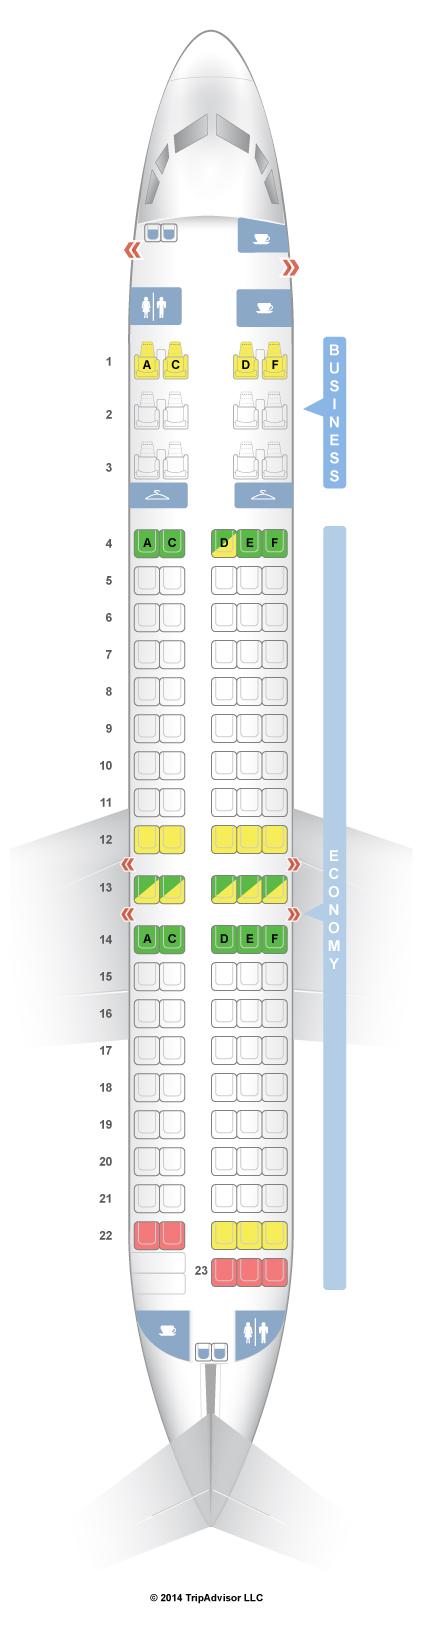 seatguru seat map qantas boeing 717 200 717 two class